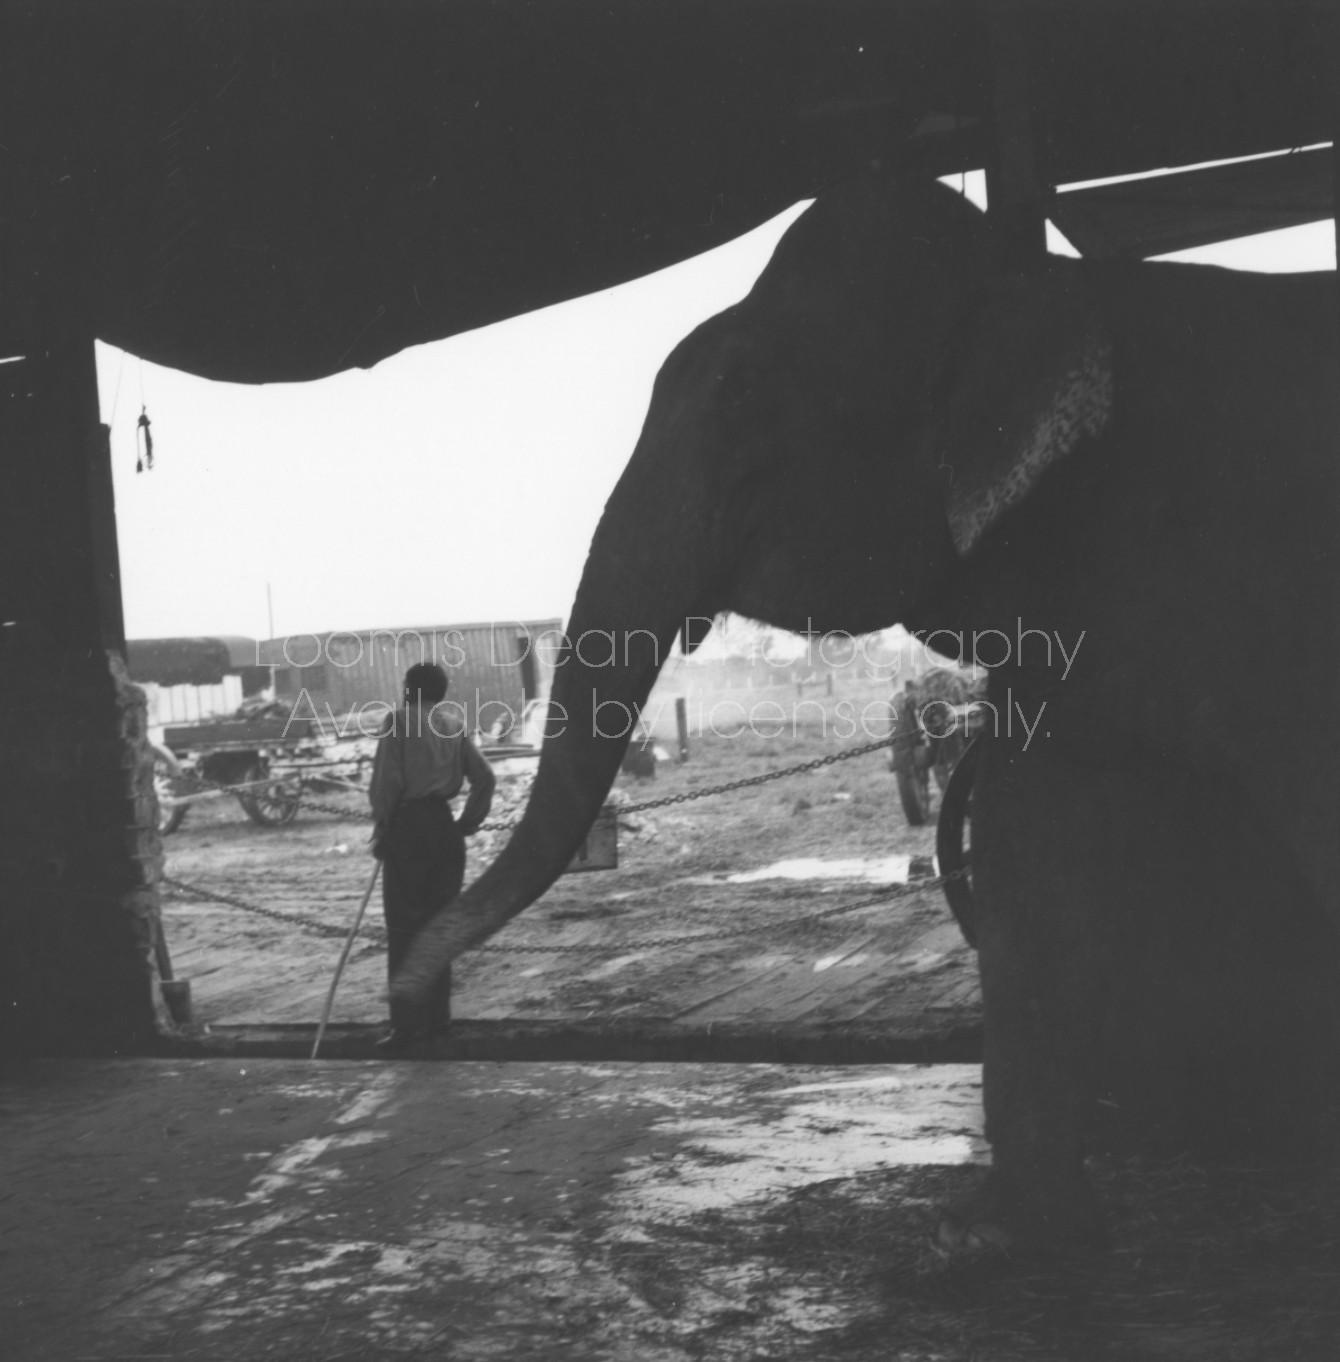 RINGLING CIRCUS ELEPHANTS 130